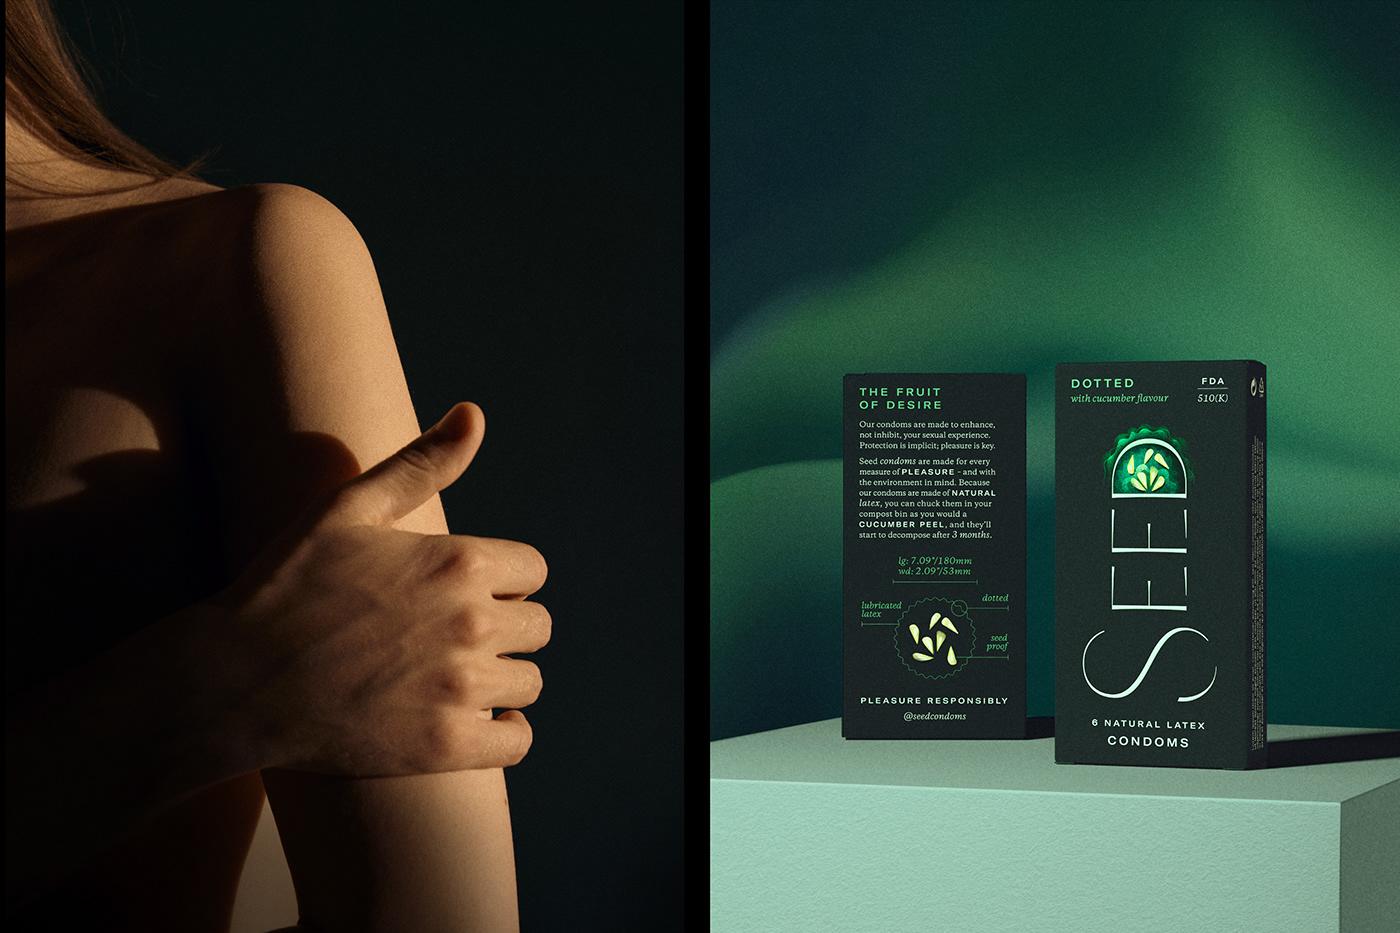 condoms desire Fruit Fruit Illustration Logo Design Packaging protection seeds sensual Sexual Wellness